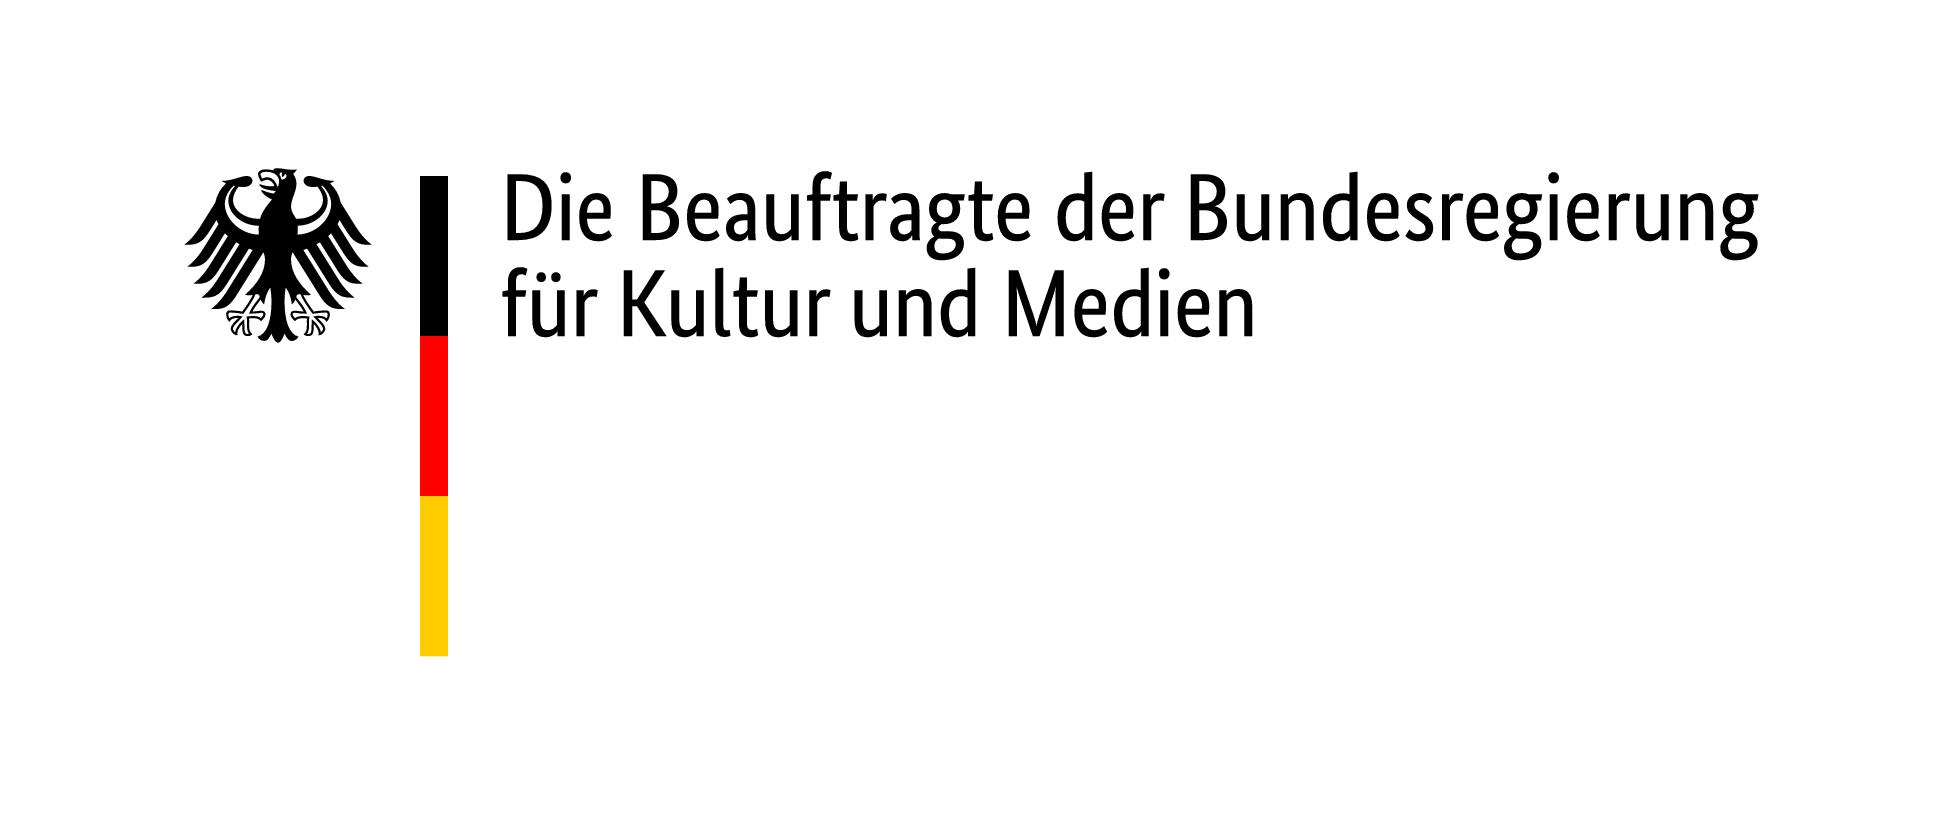 BKM_2017_Office_Farbe_de.png (23 KB)